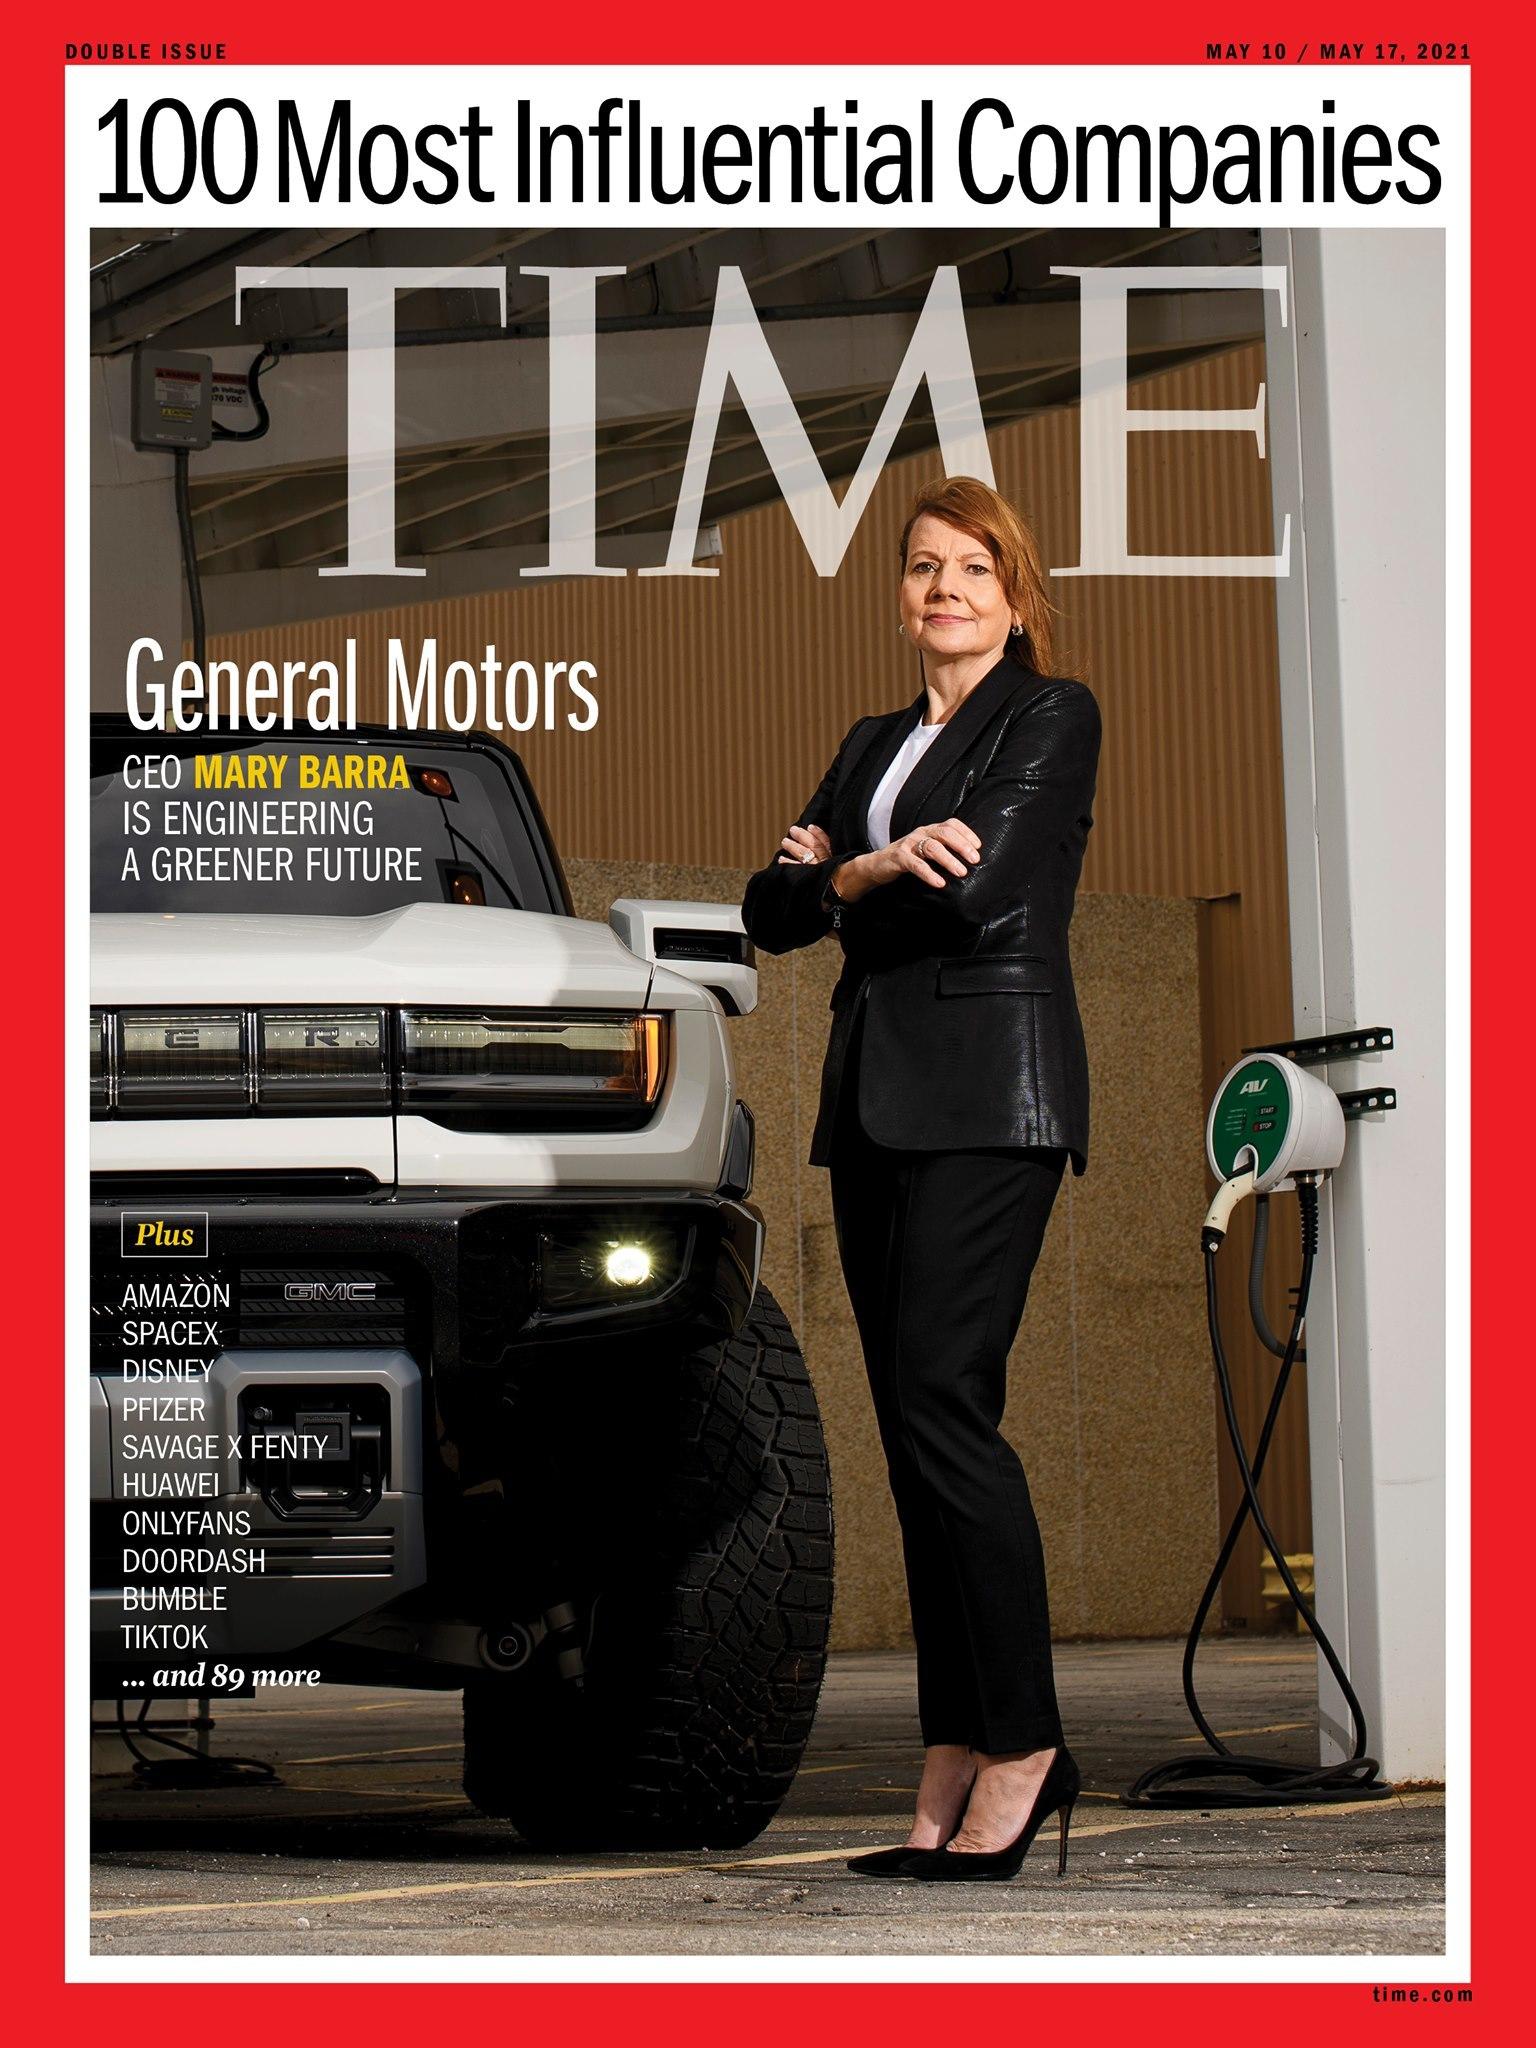 Mary Barra portada Time 100 empresas más influyentes